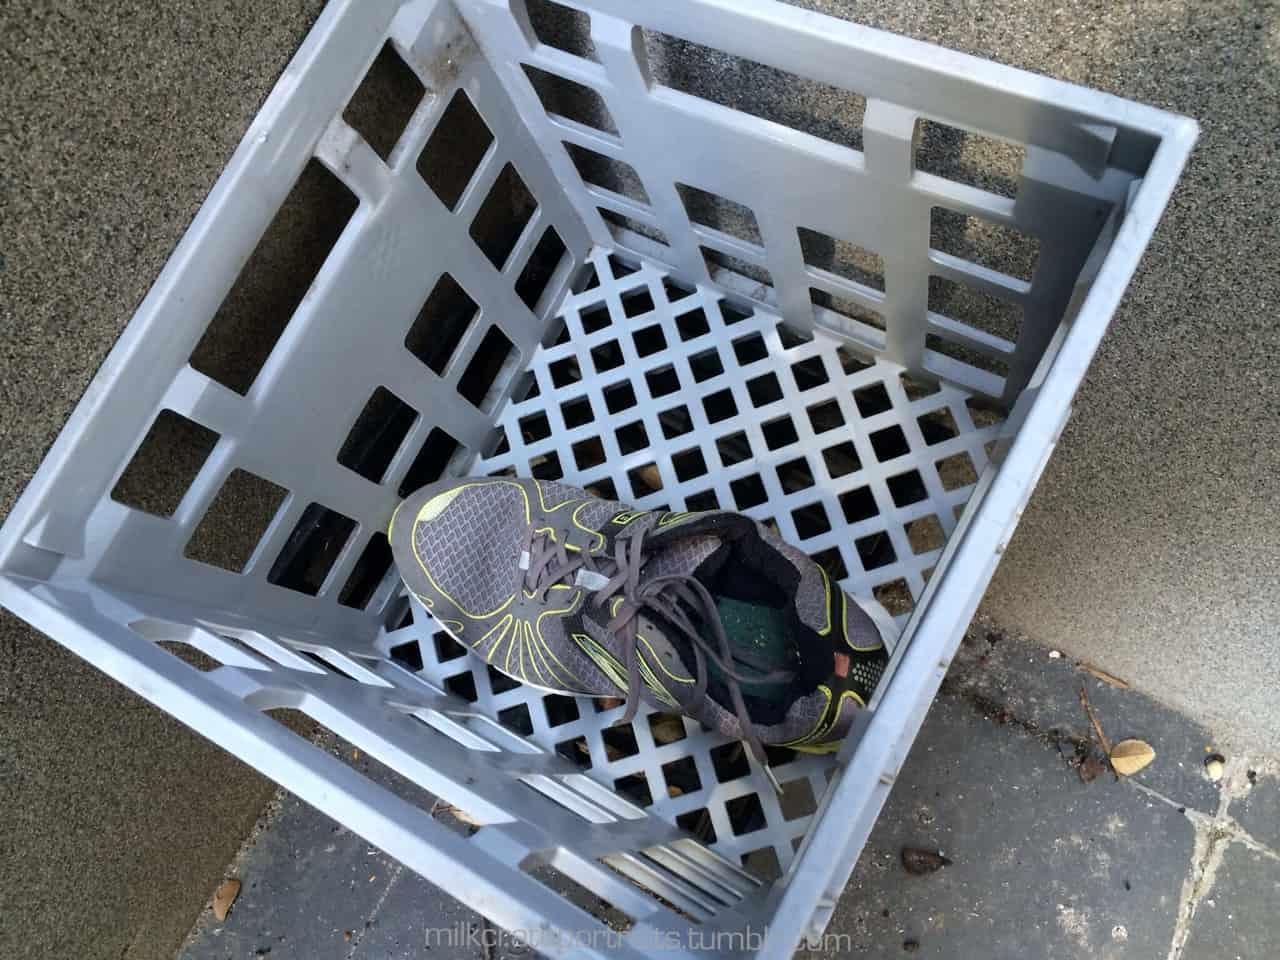 Spare sneaker